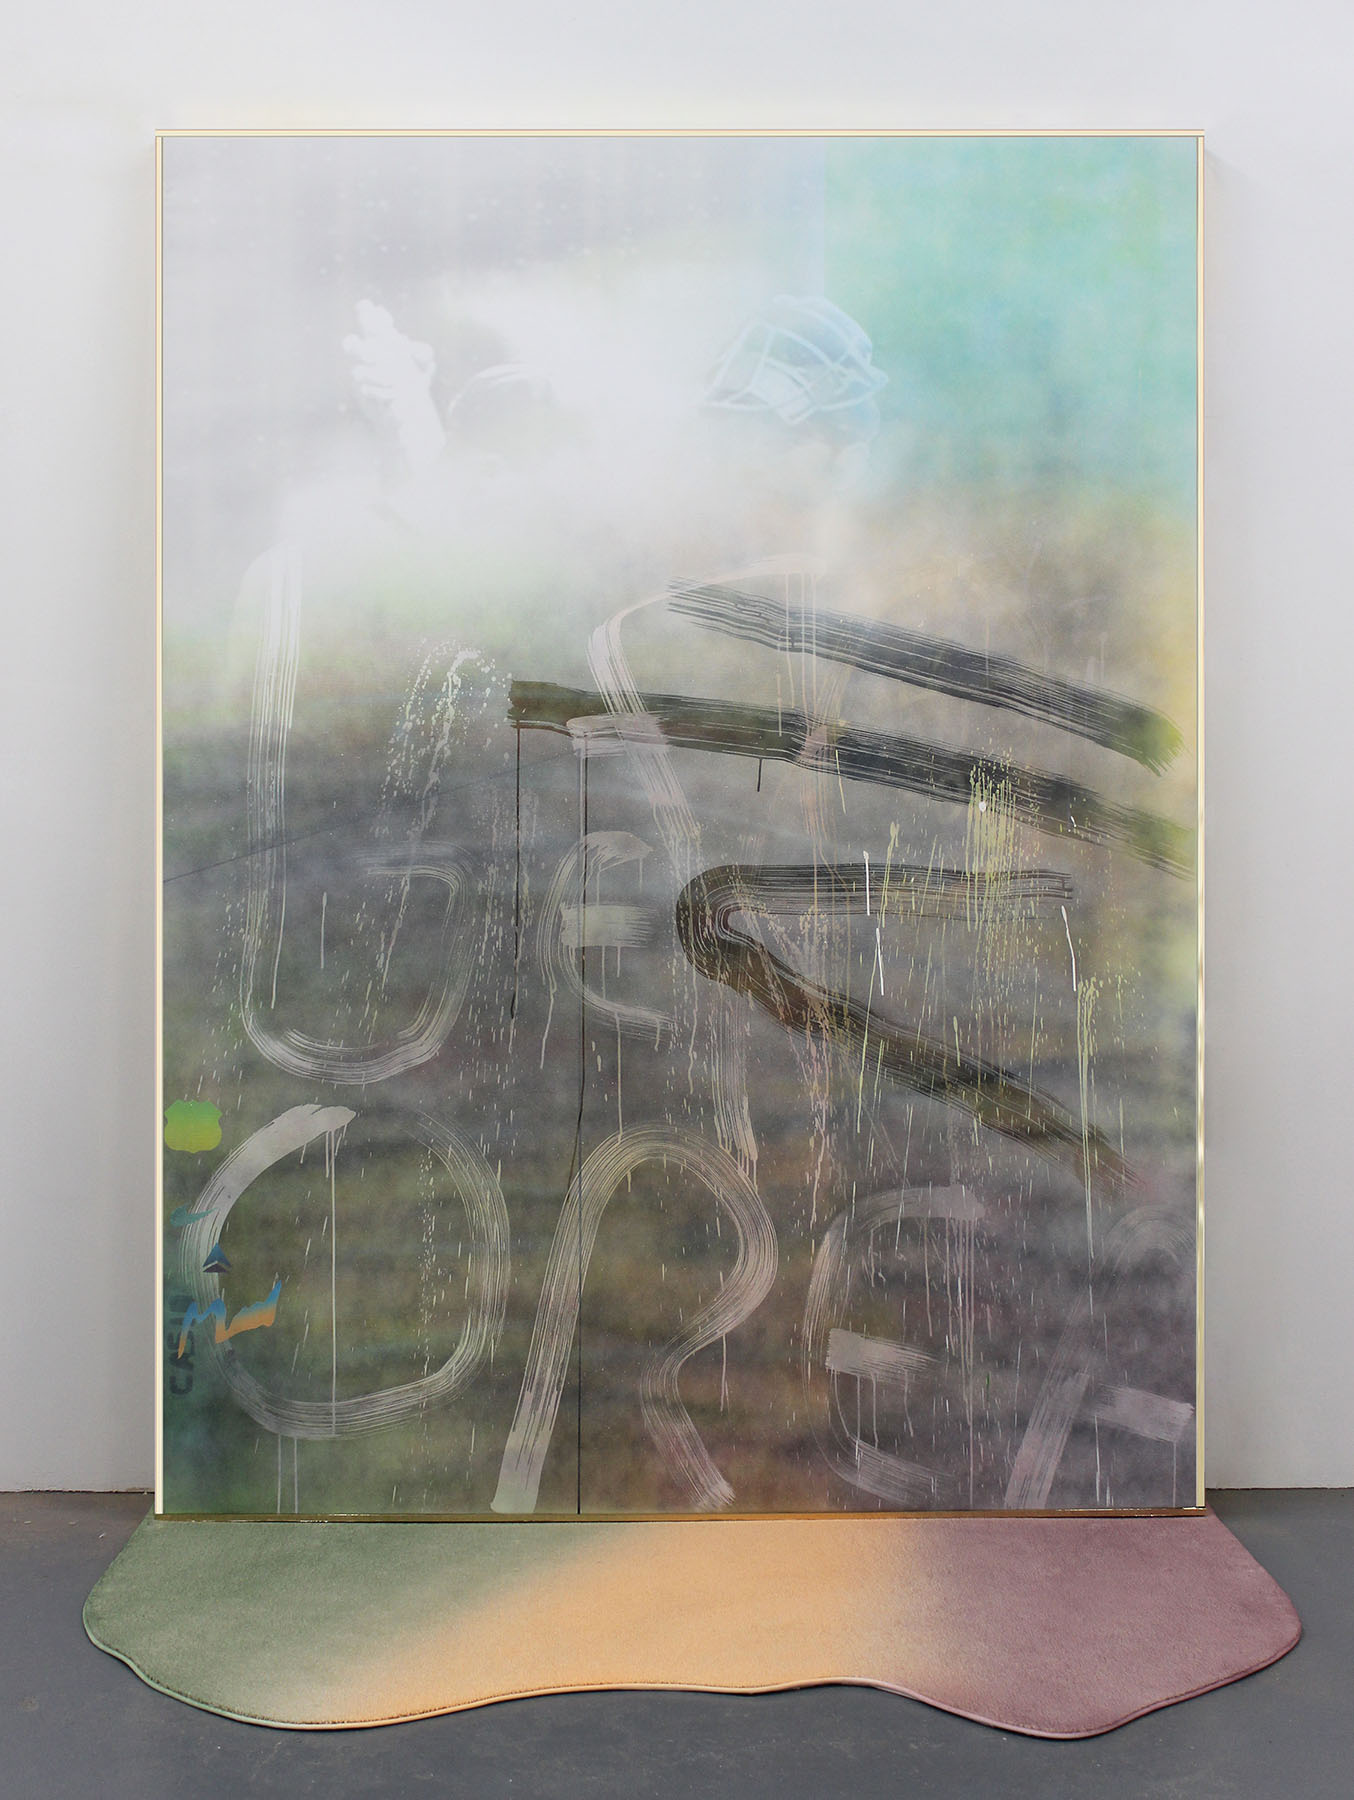 Wendy White, The Midge Game, 2014, acrylic on UV vinyl, wood and gold mylar fram